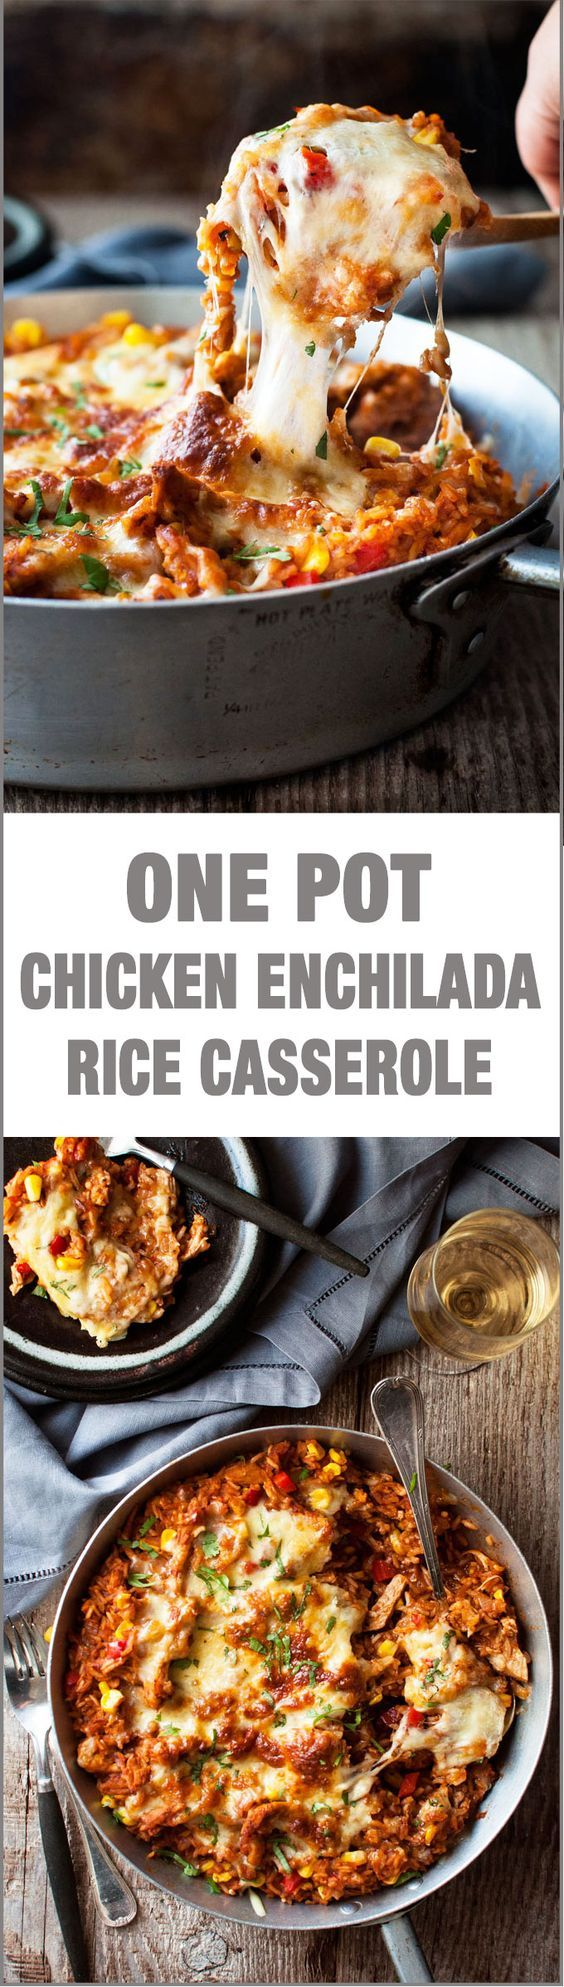 One Pot Chicken Enchilada Rice Casserole - the flavours of chicken enchilada in…